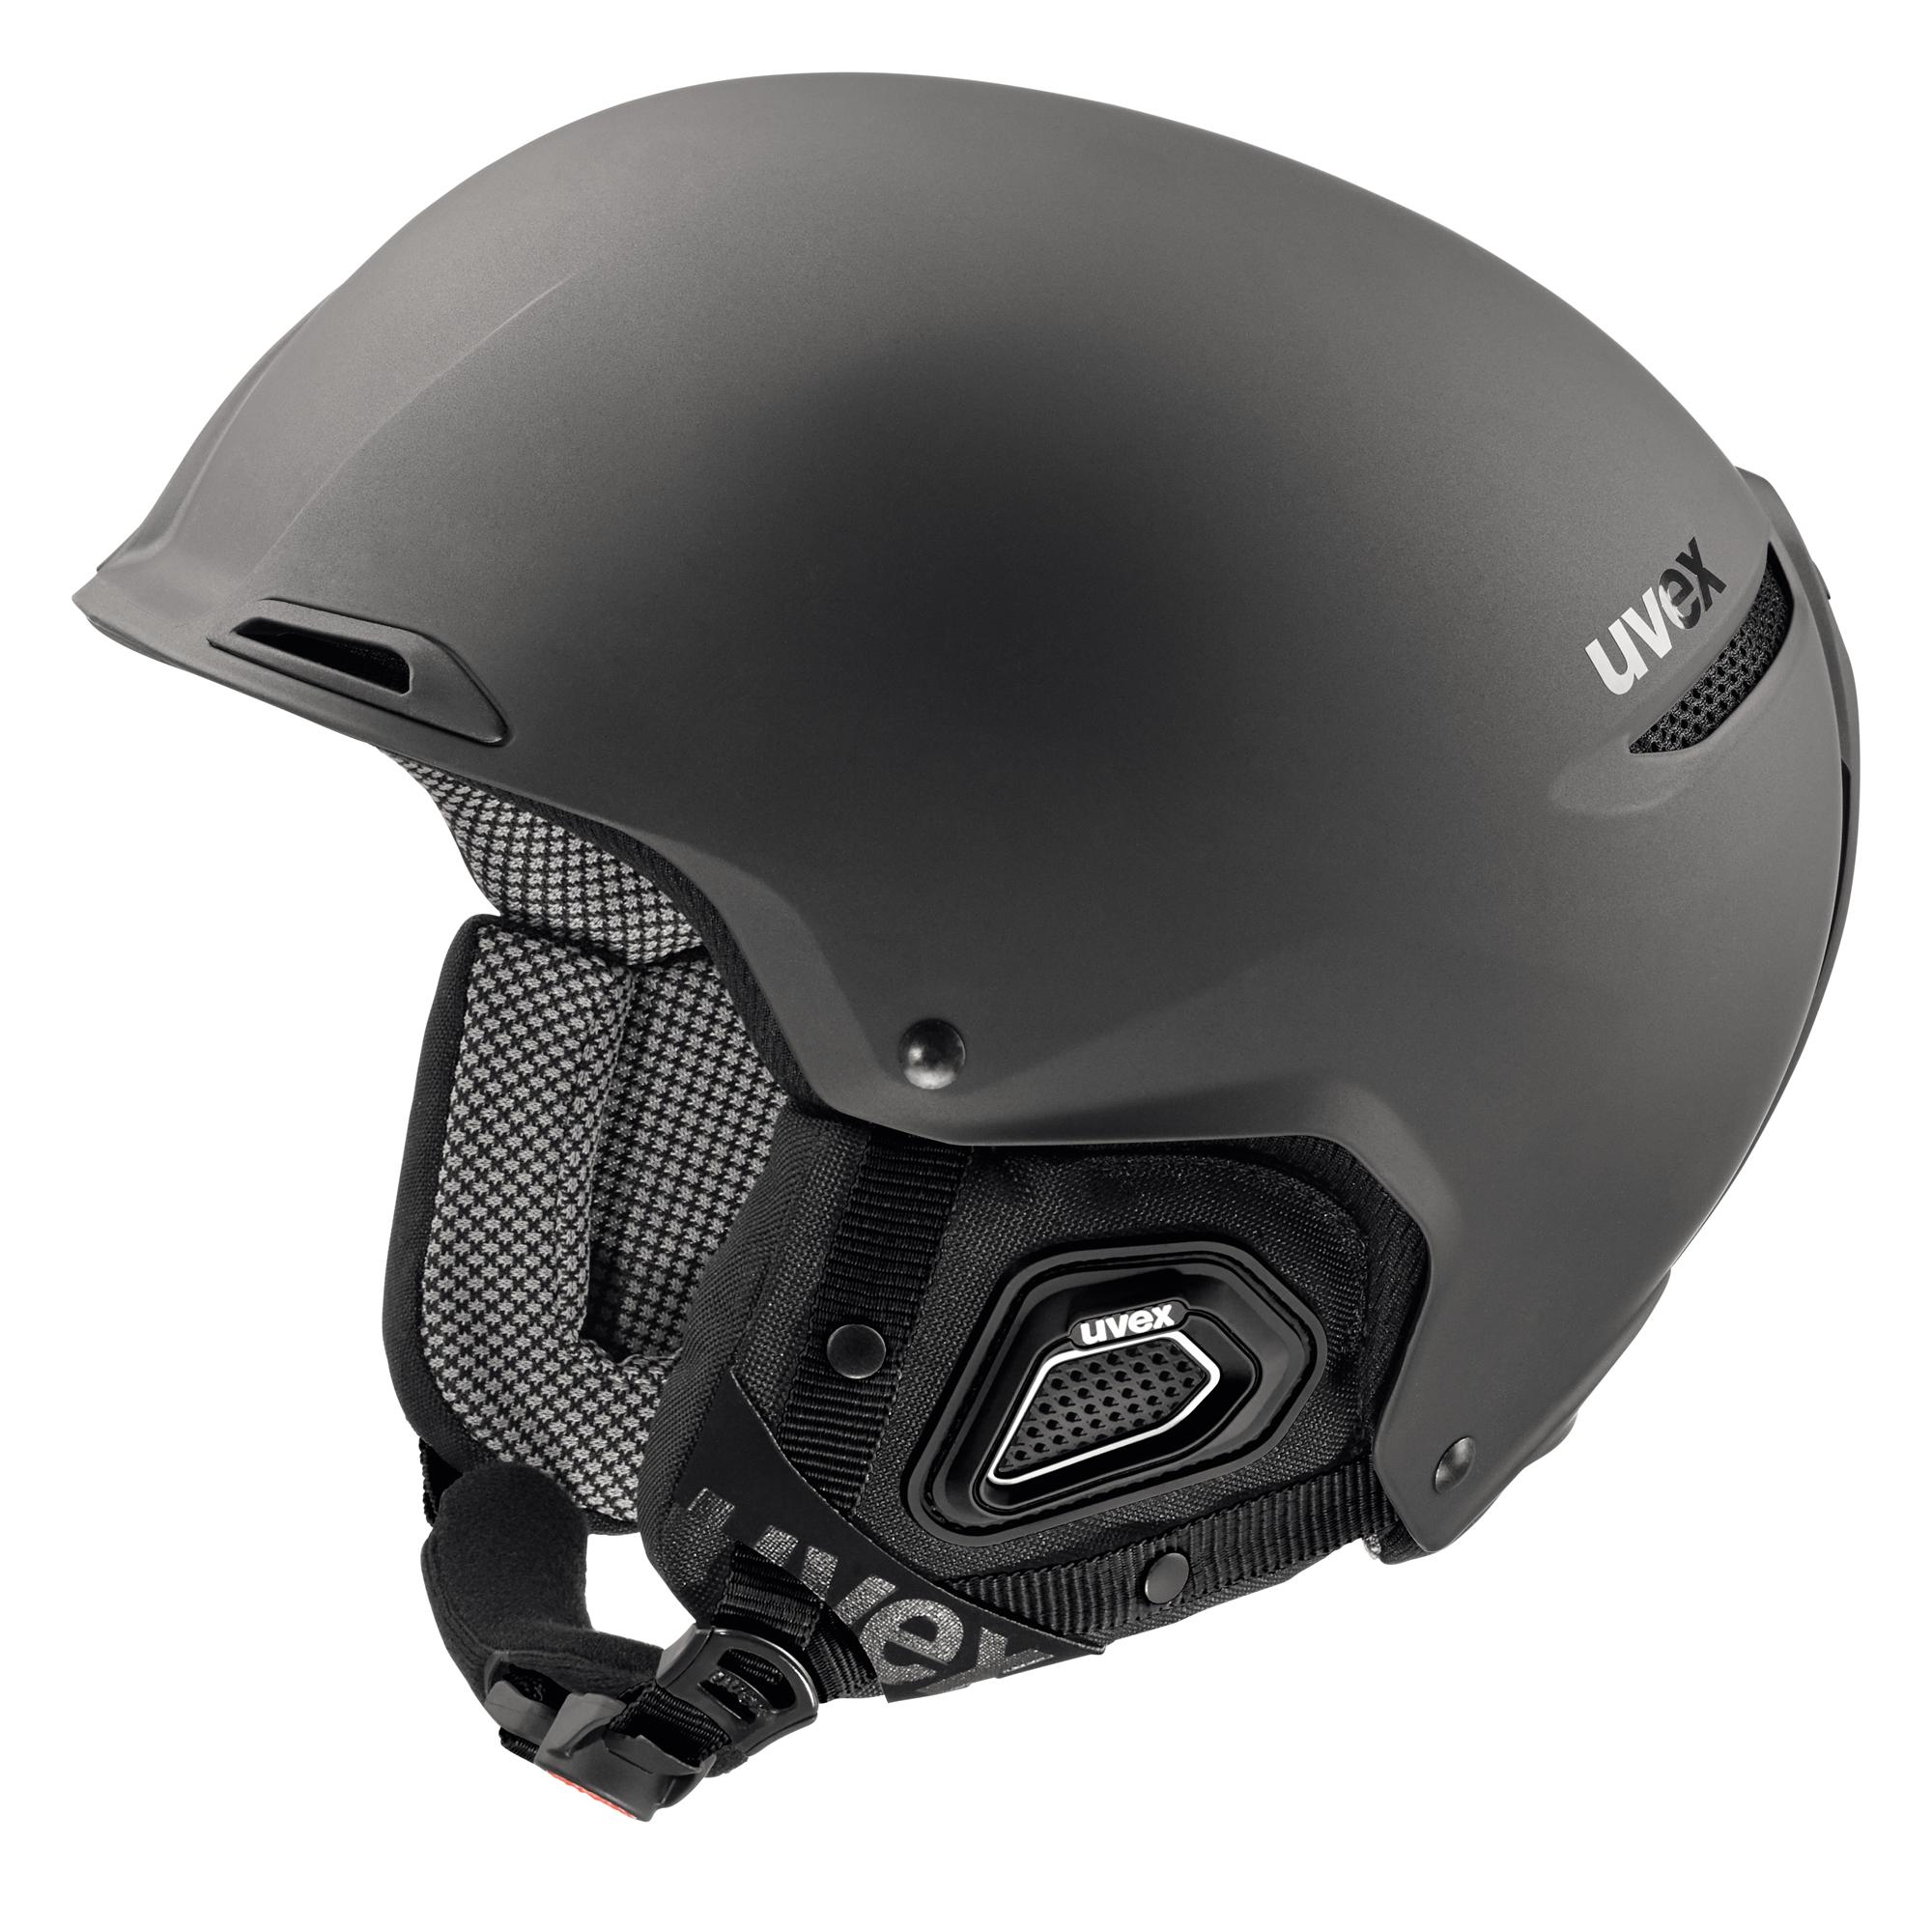 UVEX JAKK+ black mat S566182200 55-59 cm